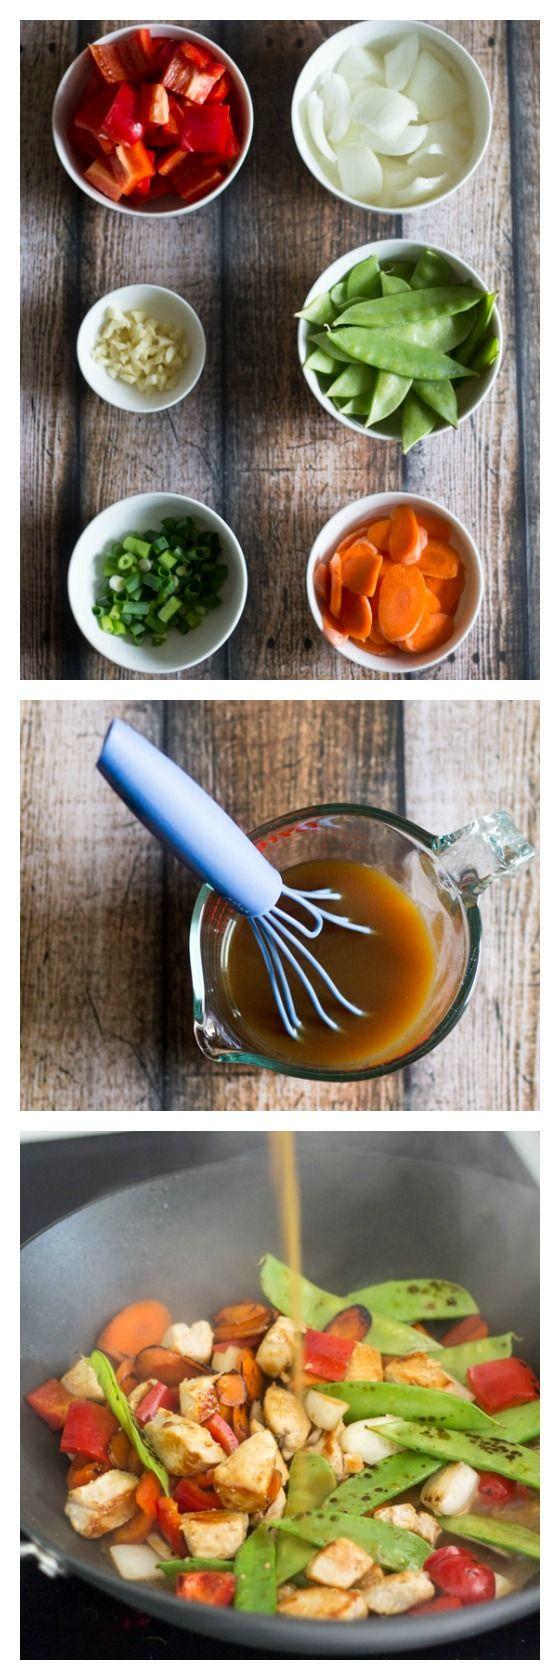 Super Easy Stir-Fry!